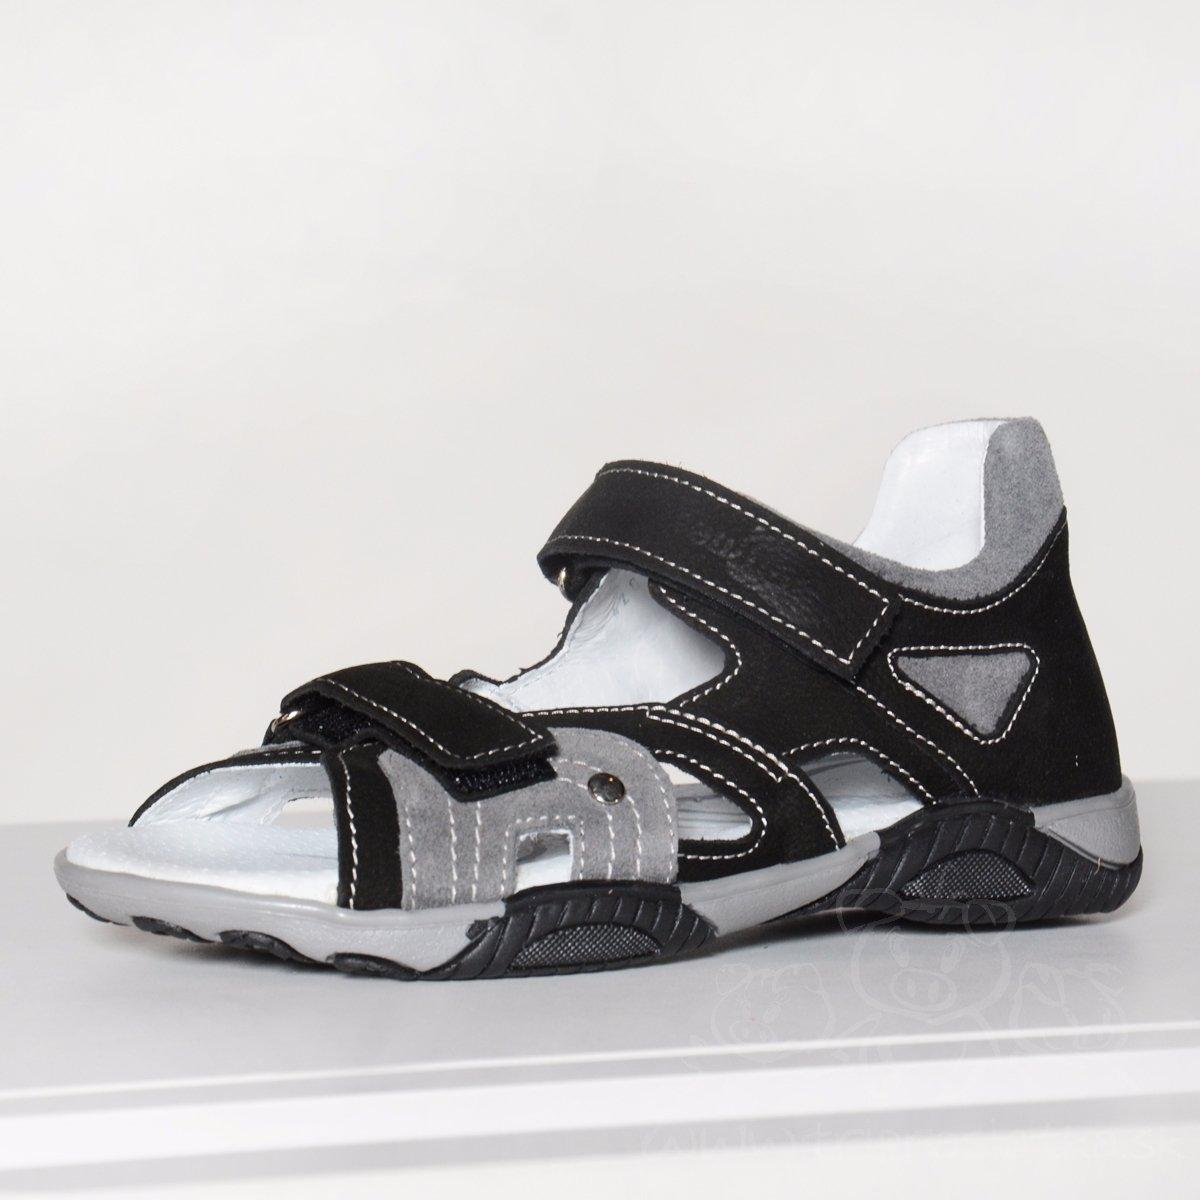 8b6656ef6196 Pohodlné kožené chlapčenské sandále   31-4282